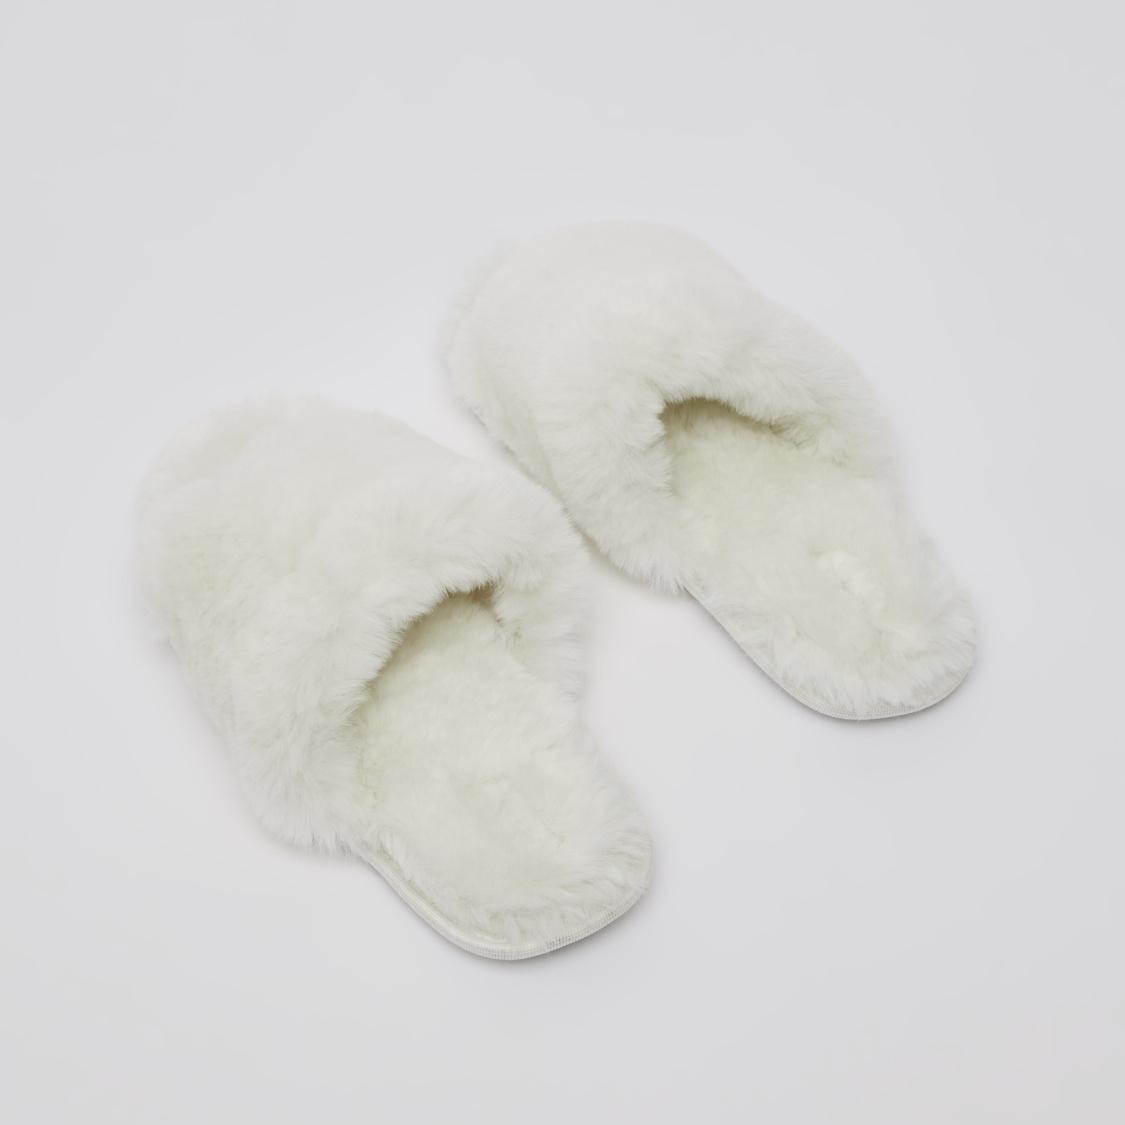 Indoor Plush Detail Slip-On Bedroom Slippers